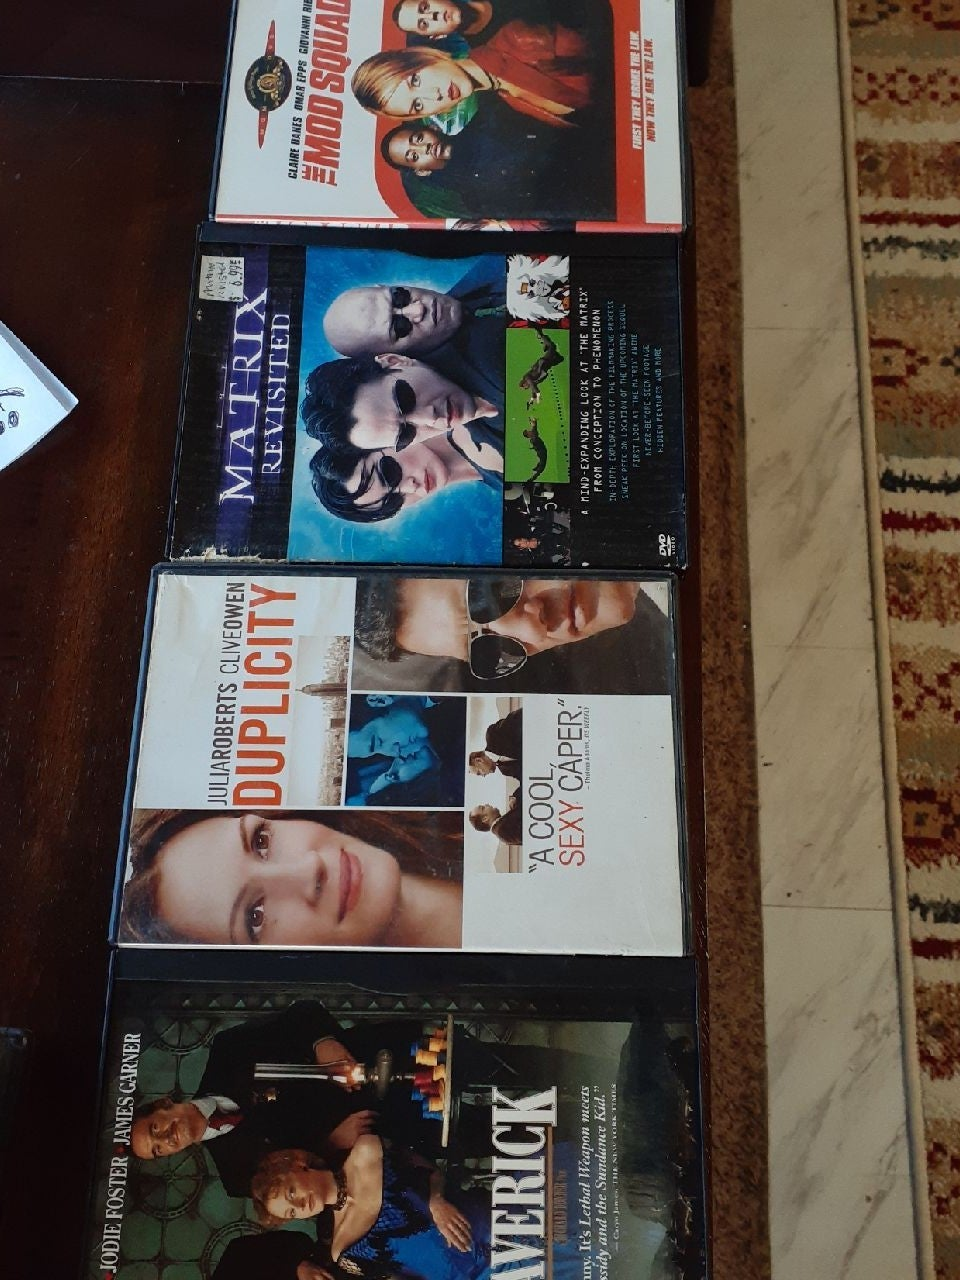 Maverick Matrix and two other movies